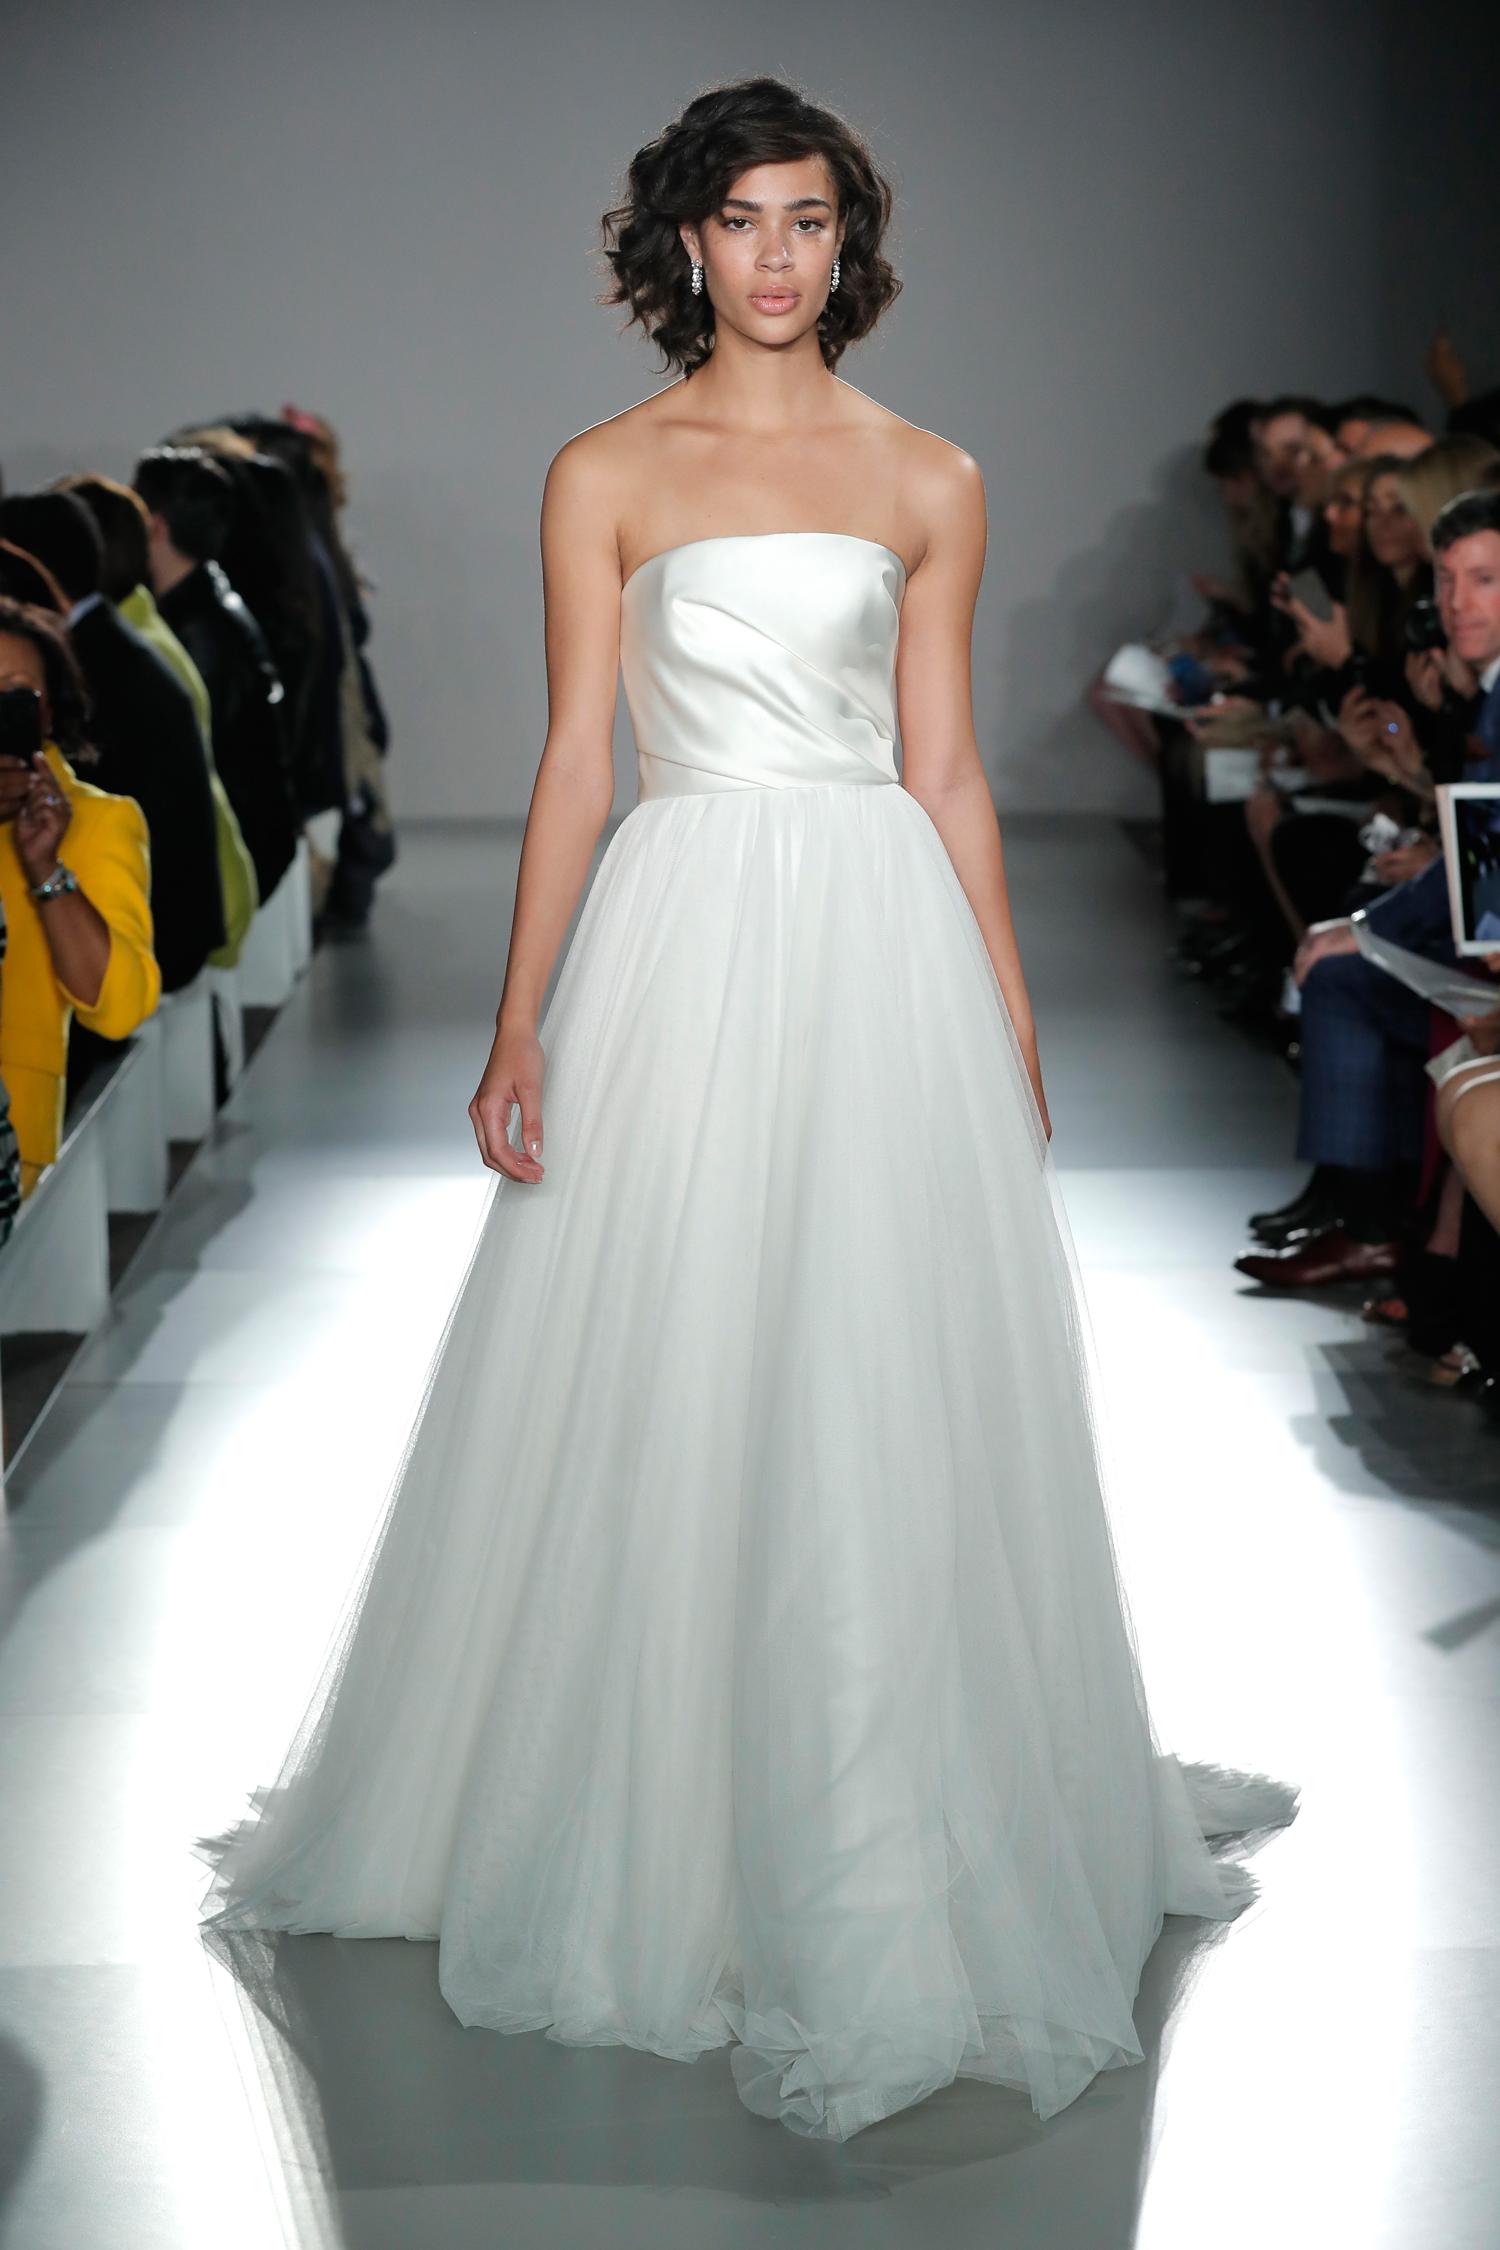 nouvelle amsale long strapless a-line tulle wedding dress spring 2020